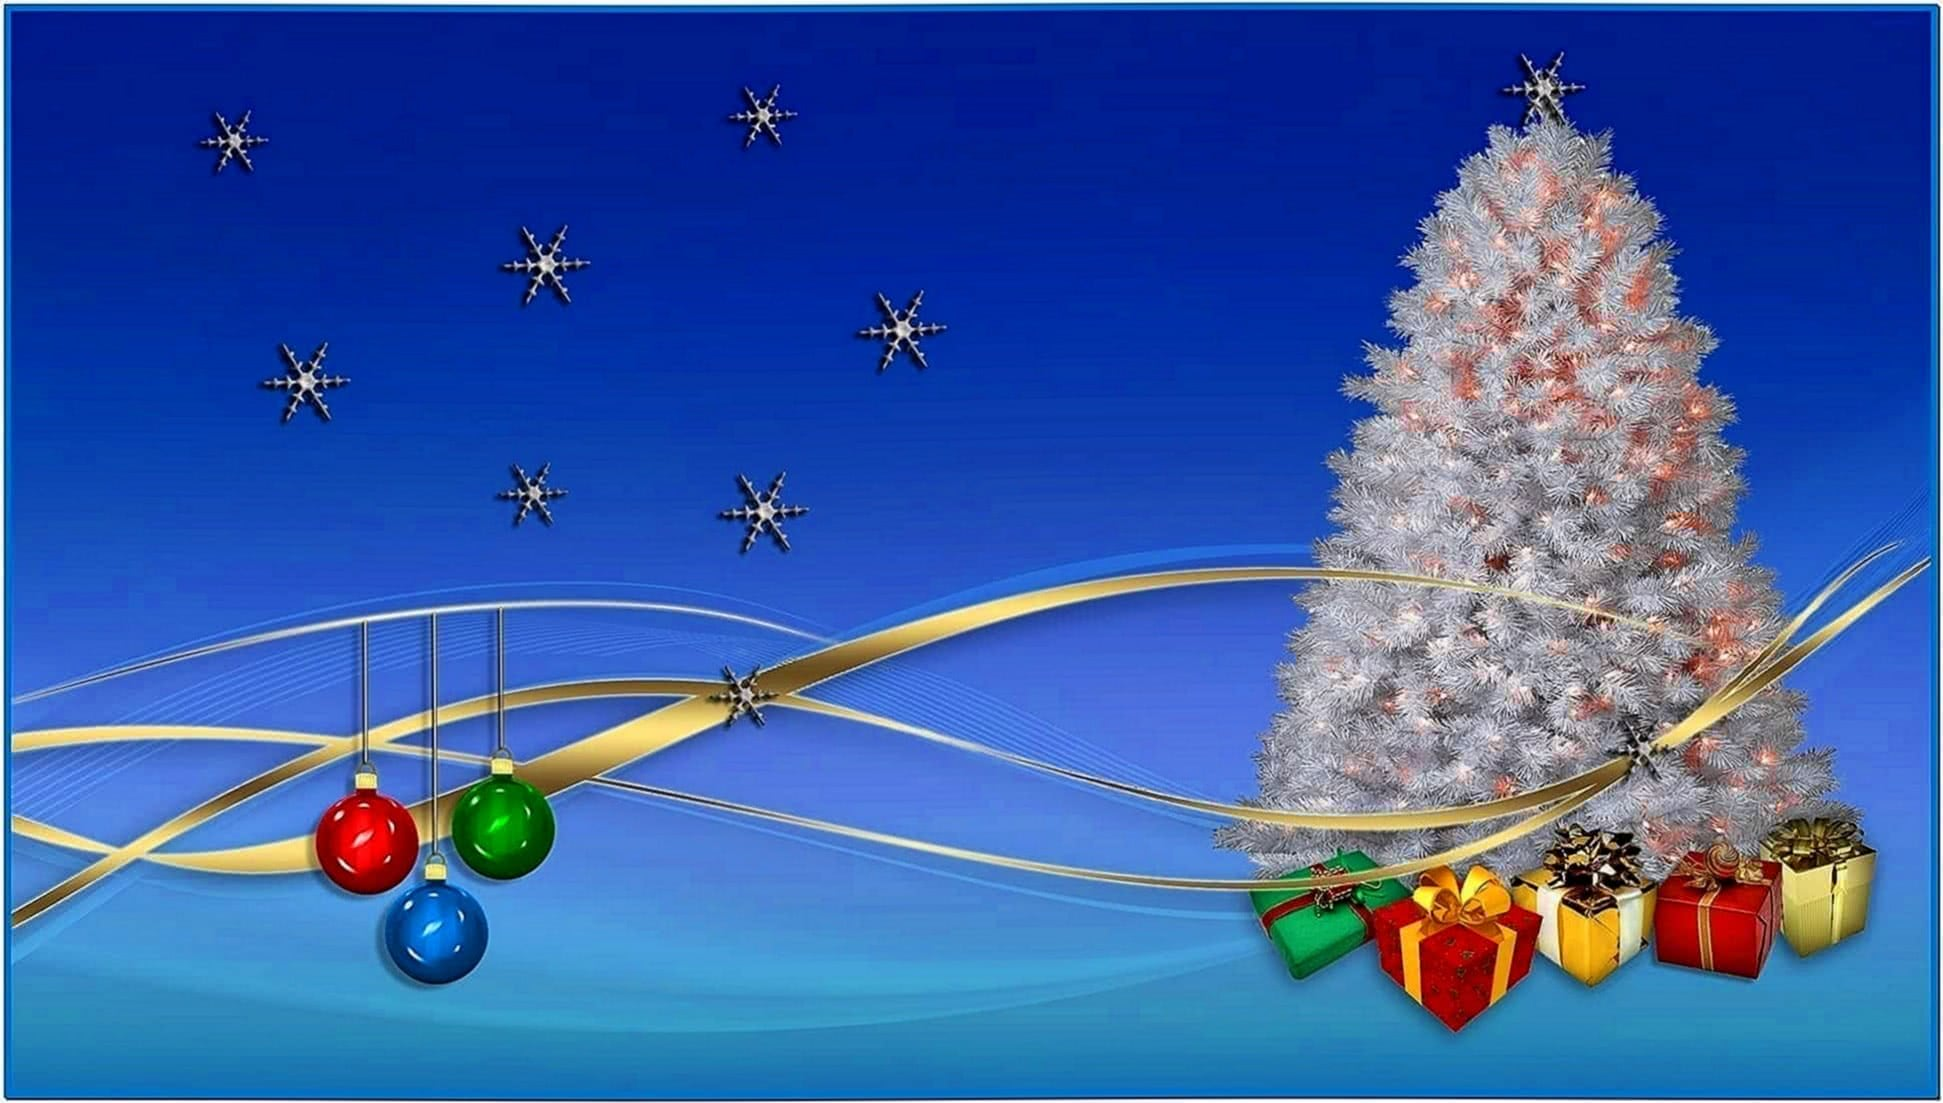 Christmas pc wallpaper screensaver - Download free